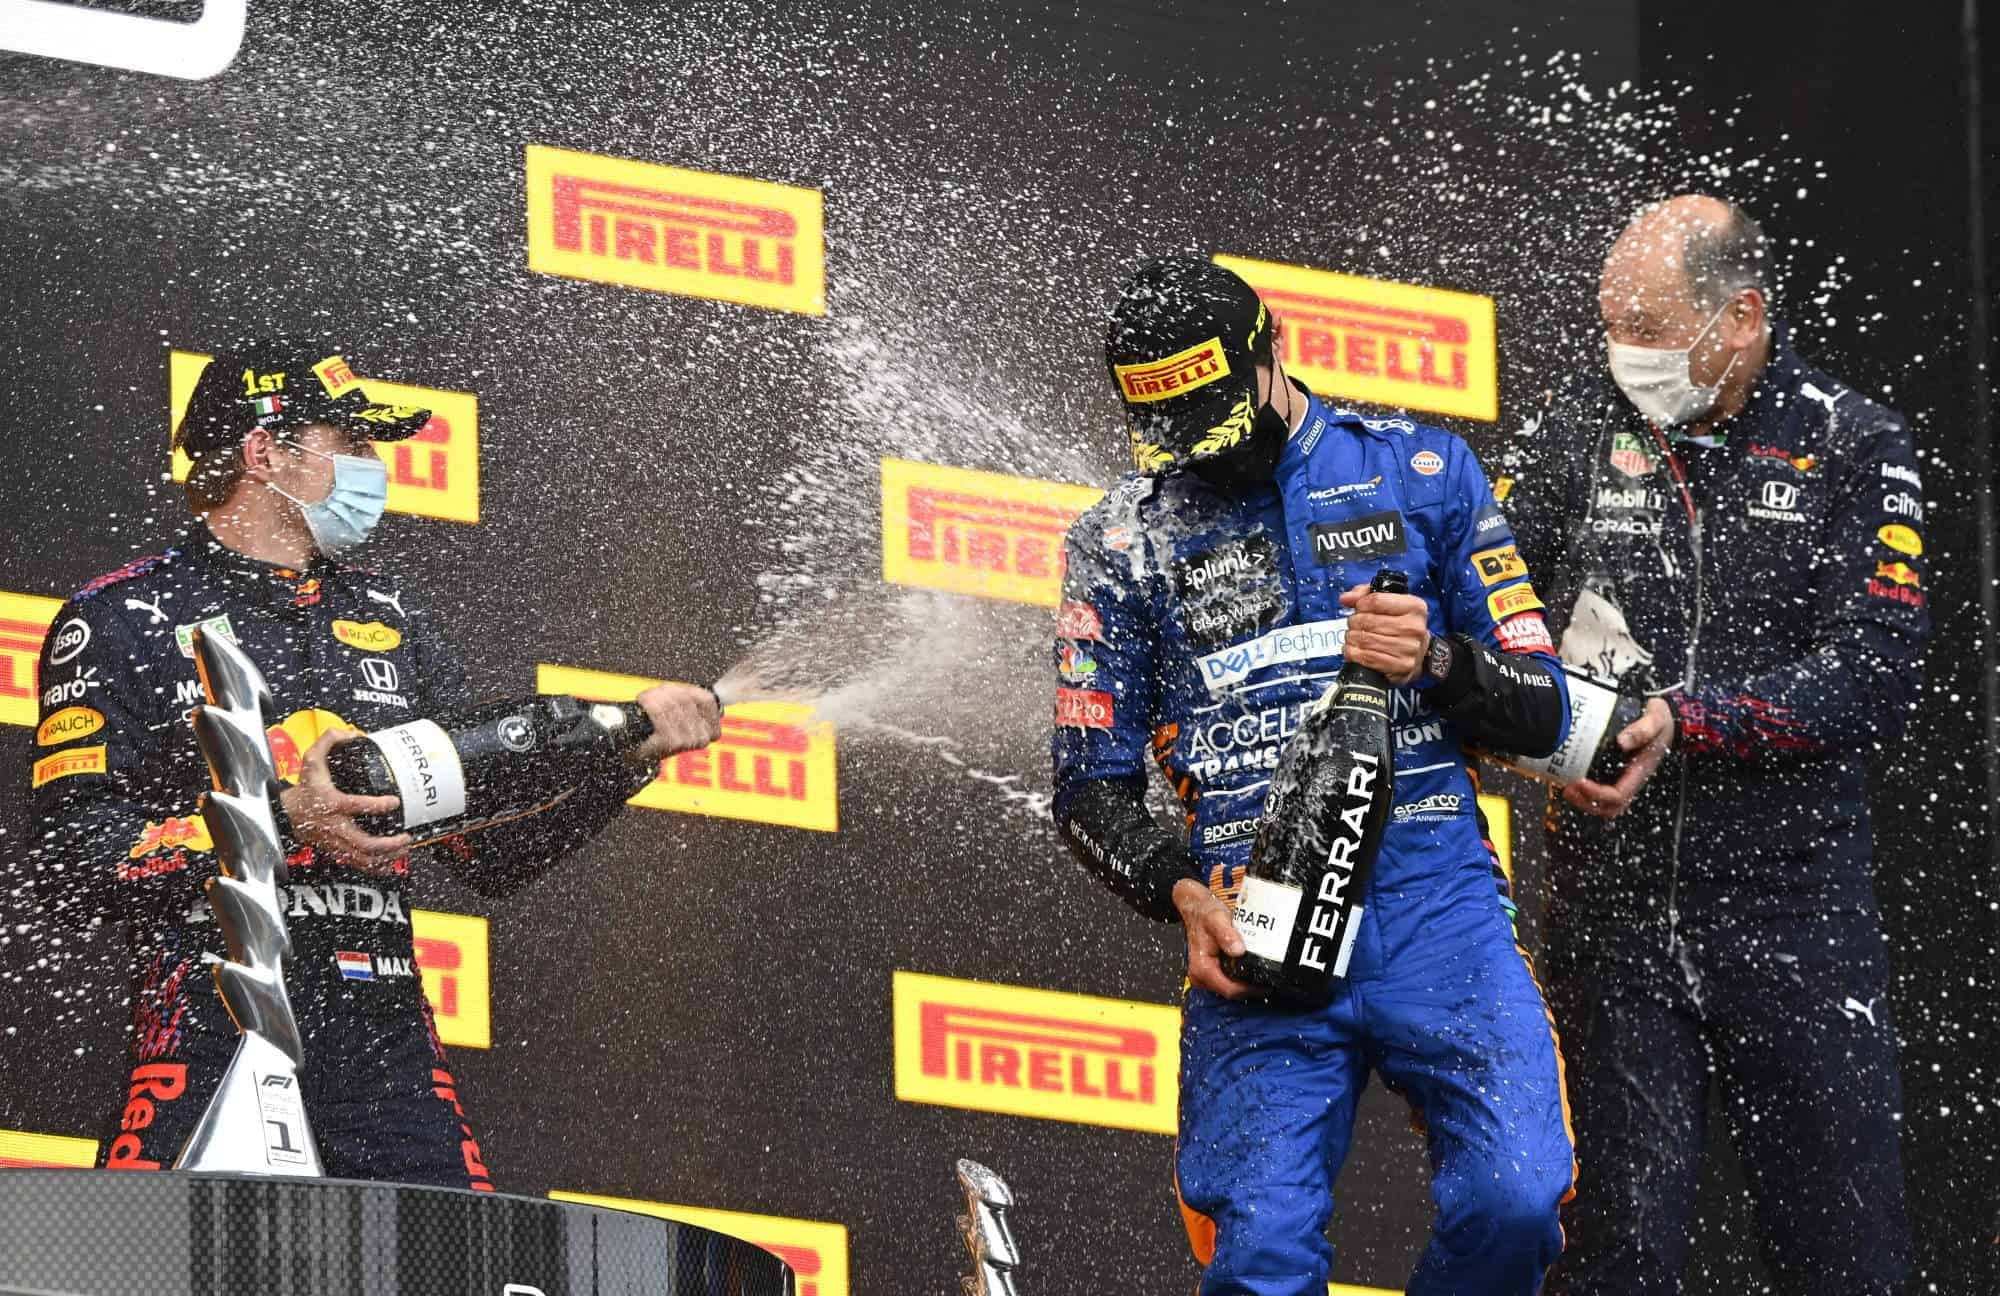 2021 Emilia Romagna GP Imola Norris and Verstappen on the podium Photo McLaren